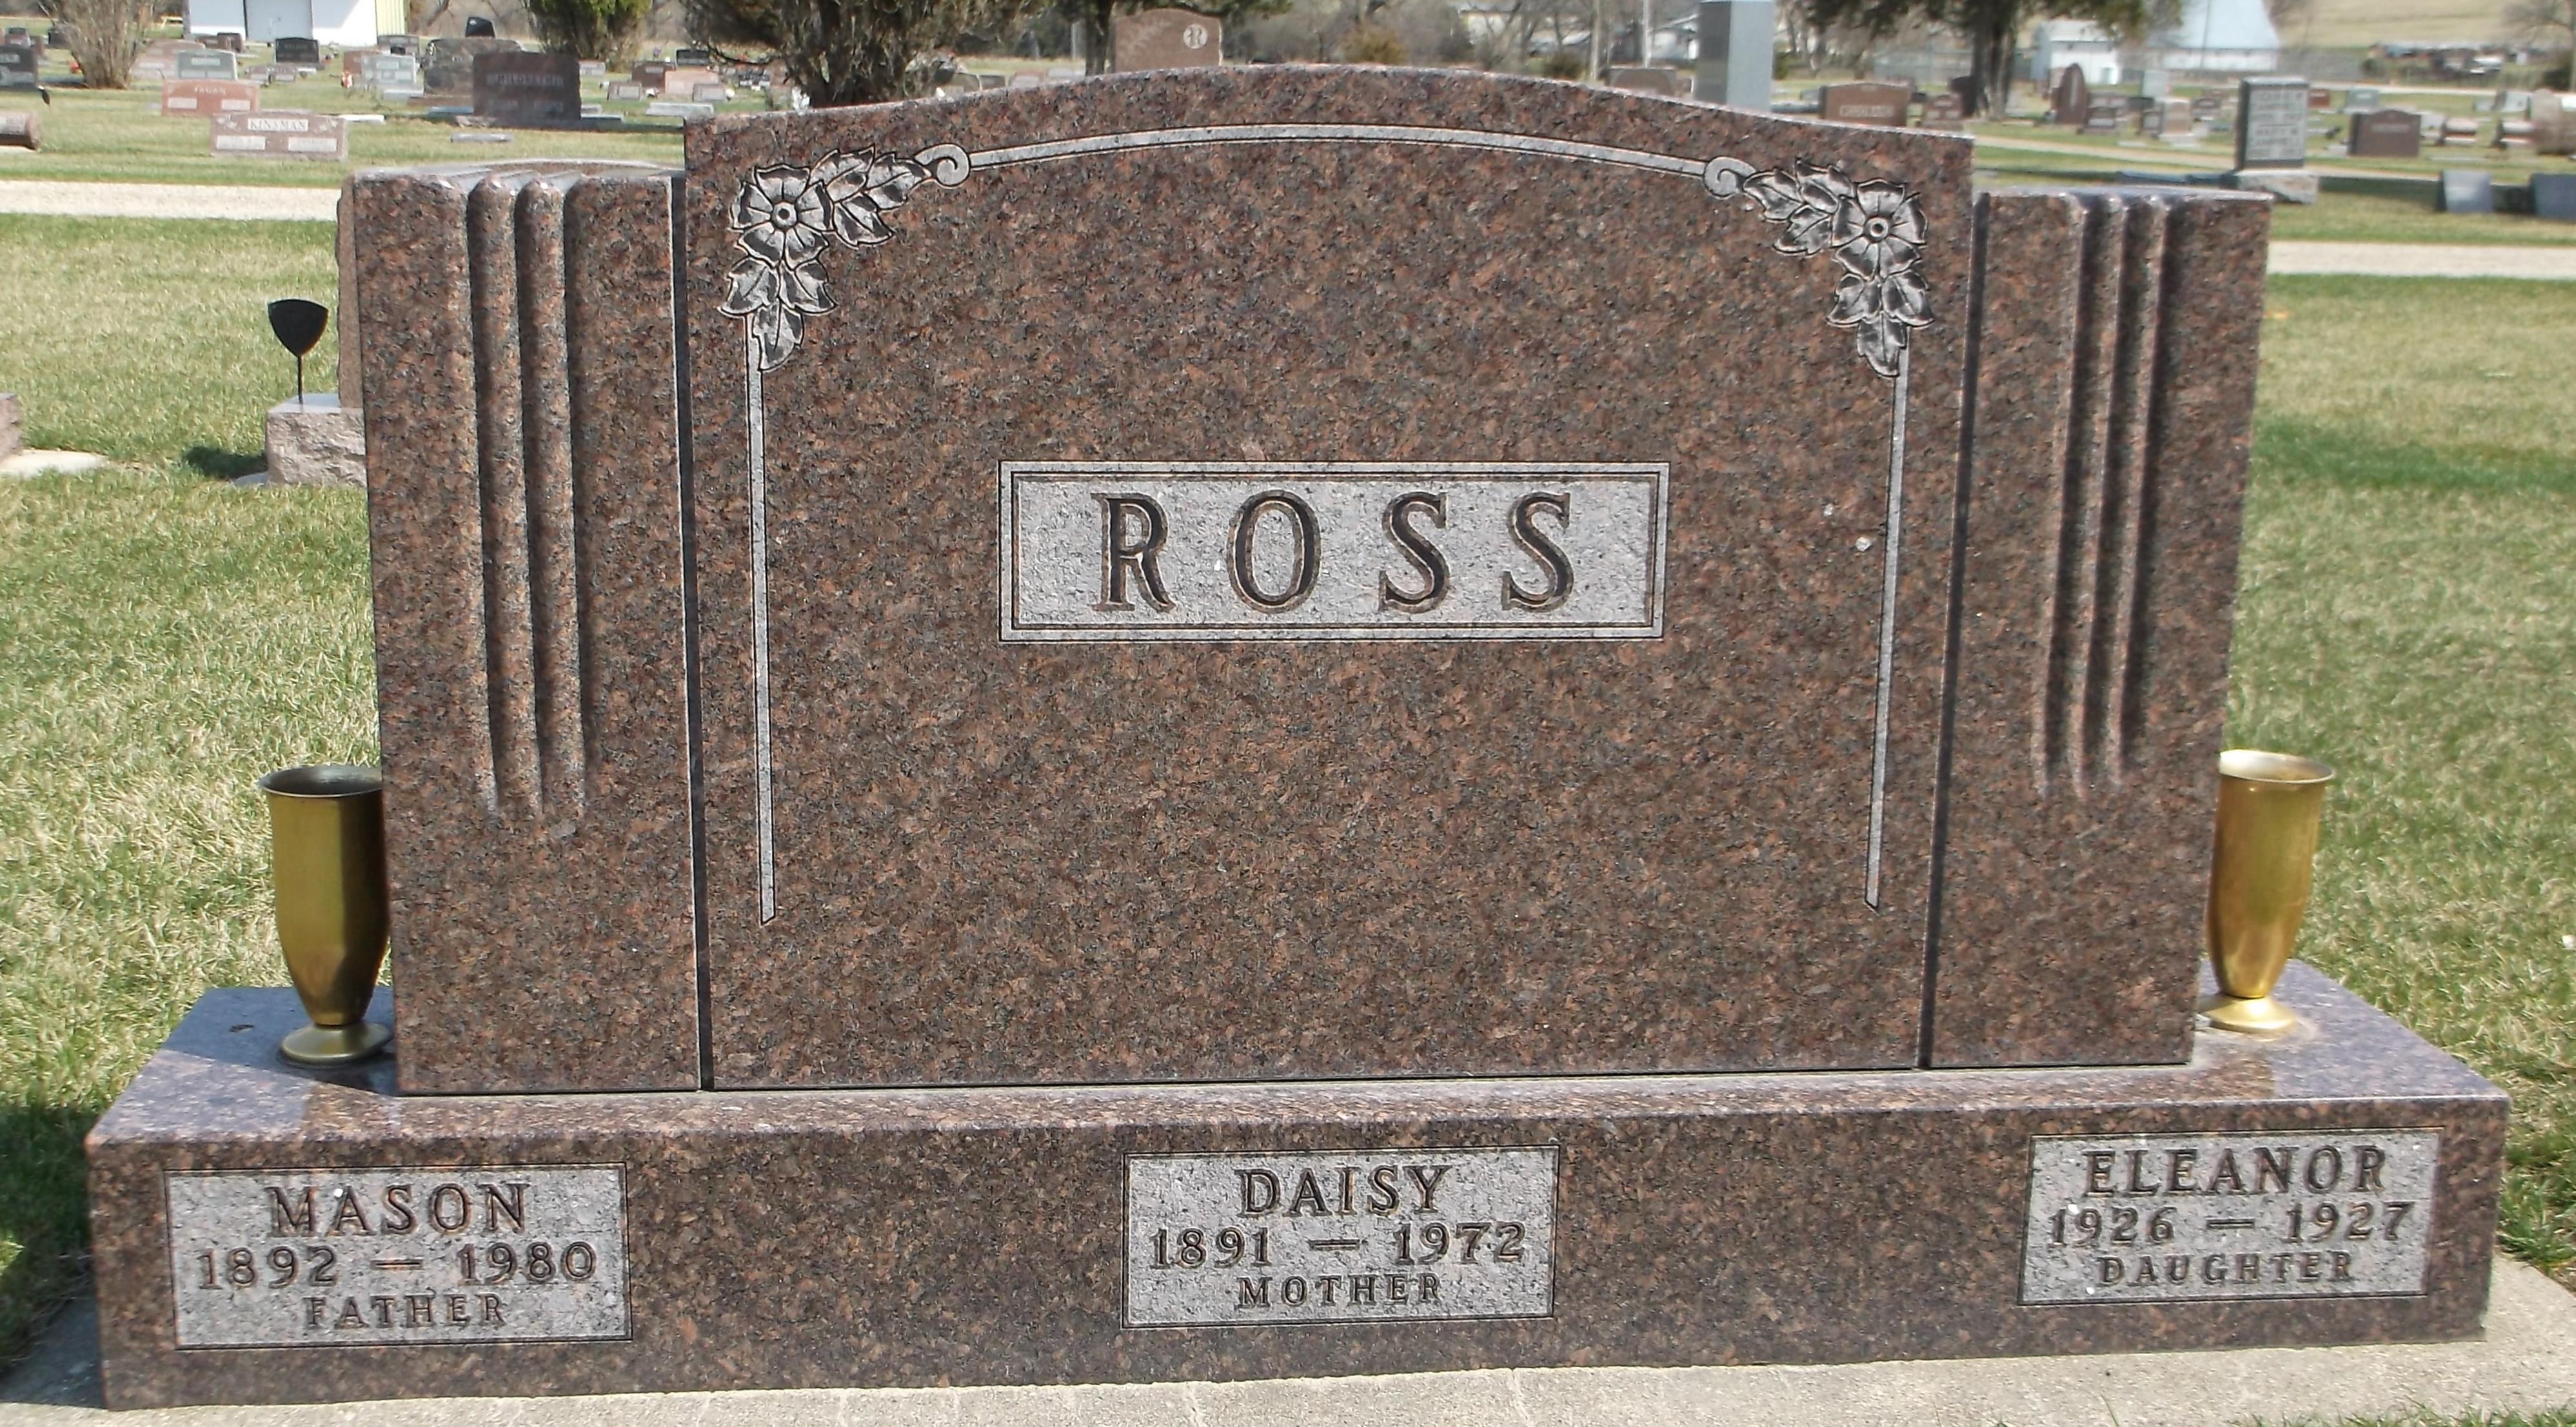 Mason H. Ross